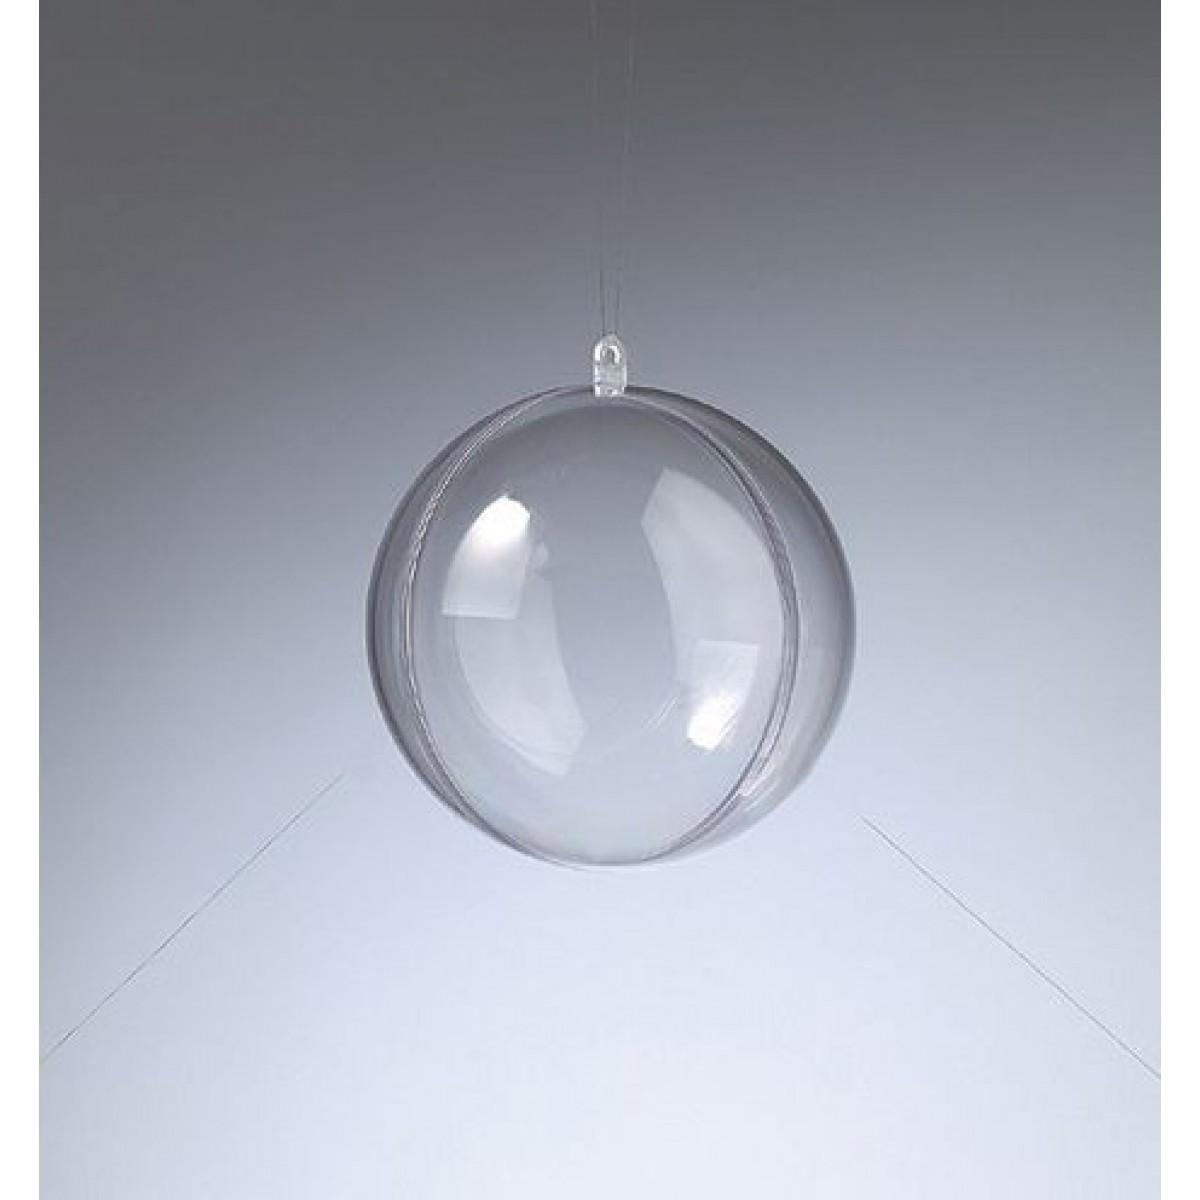 Efco Πλαστική Μπάλα Διάφανη 80mm Υλικά Χειροτεχνίας